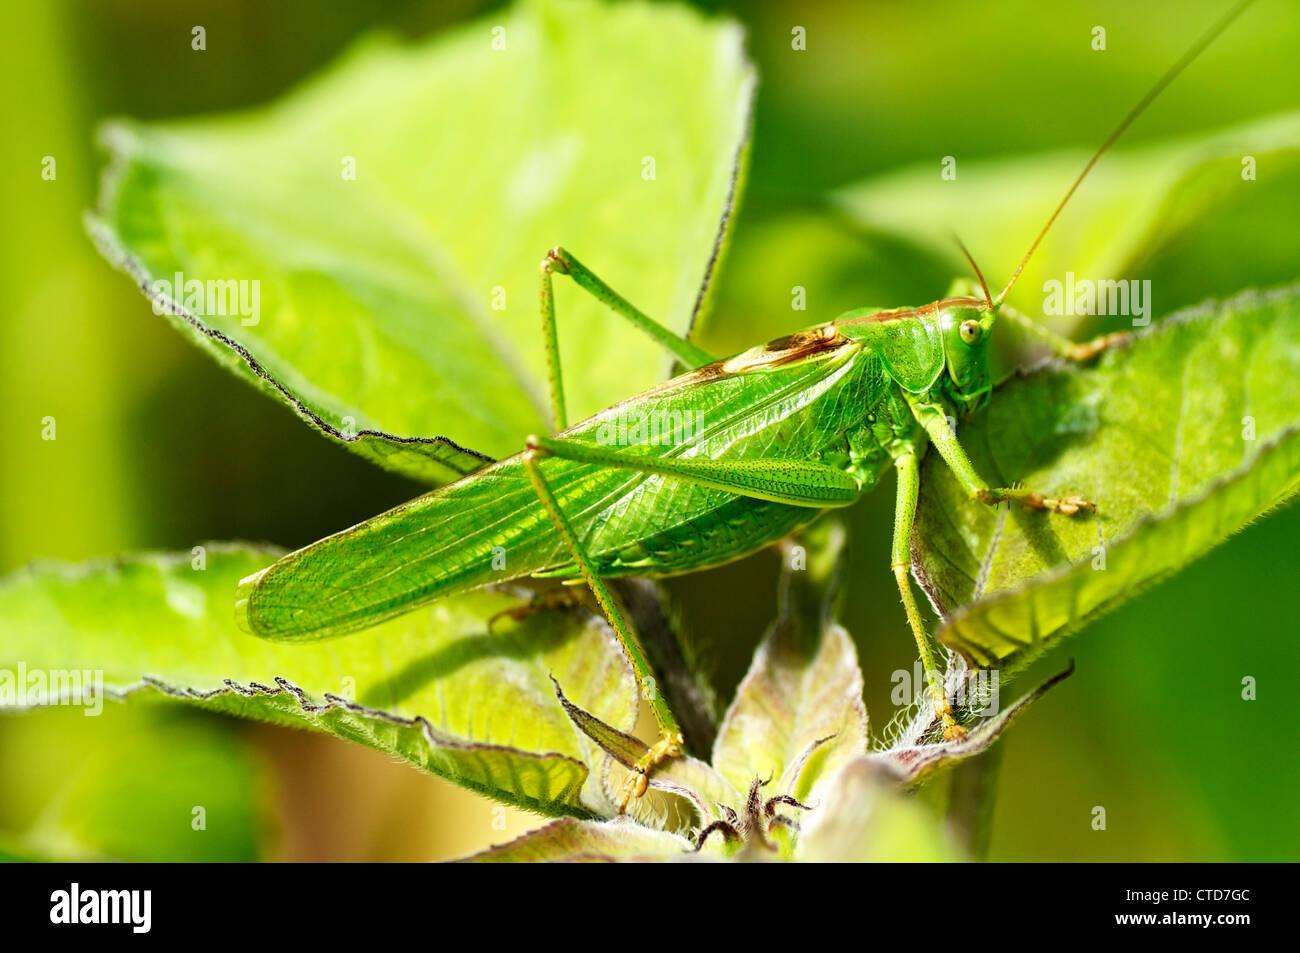 Nahaufnahme einer großen grünen Busch Grille (Tettigonia Viridissima) Stockbild